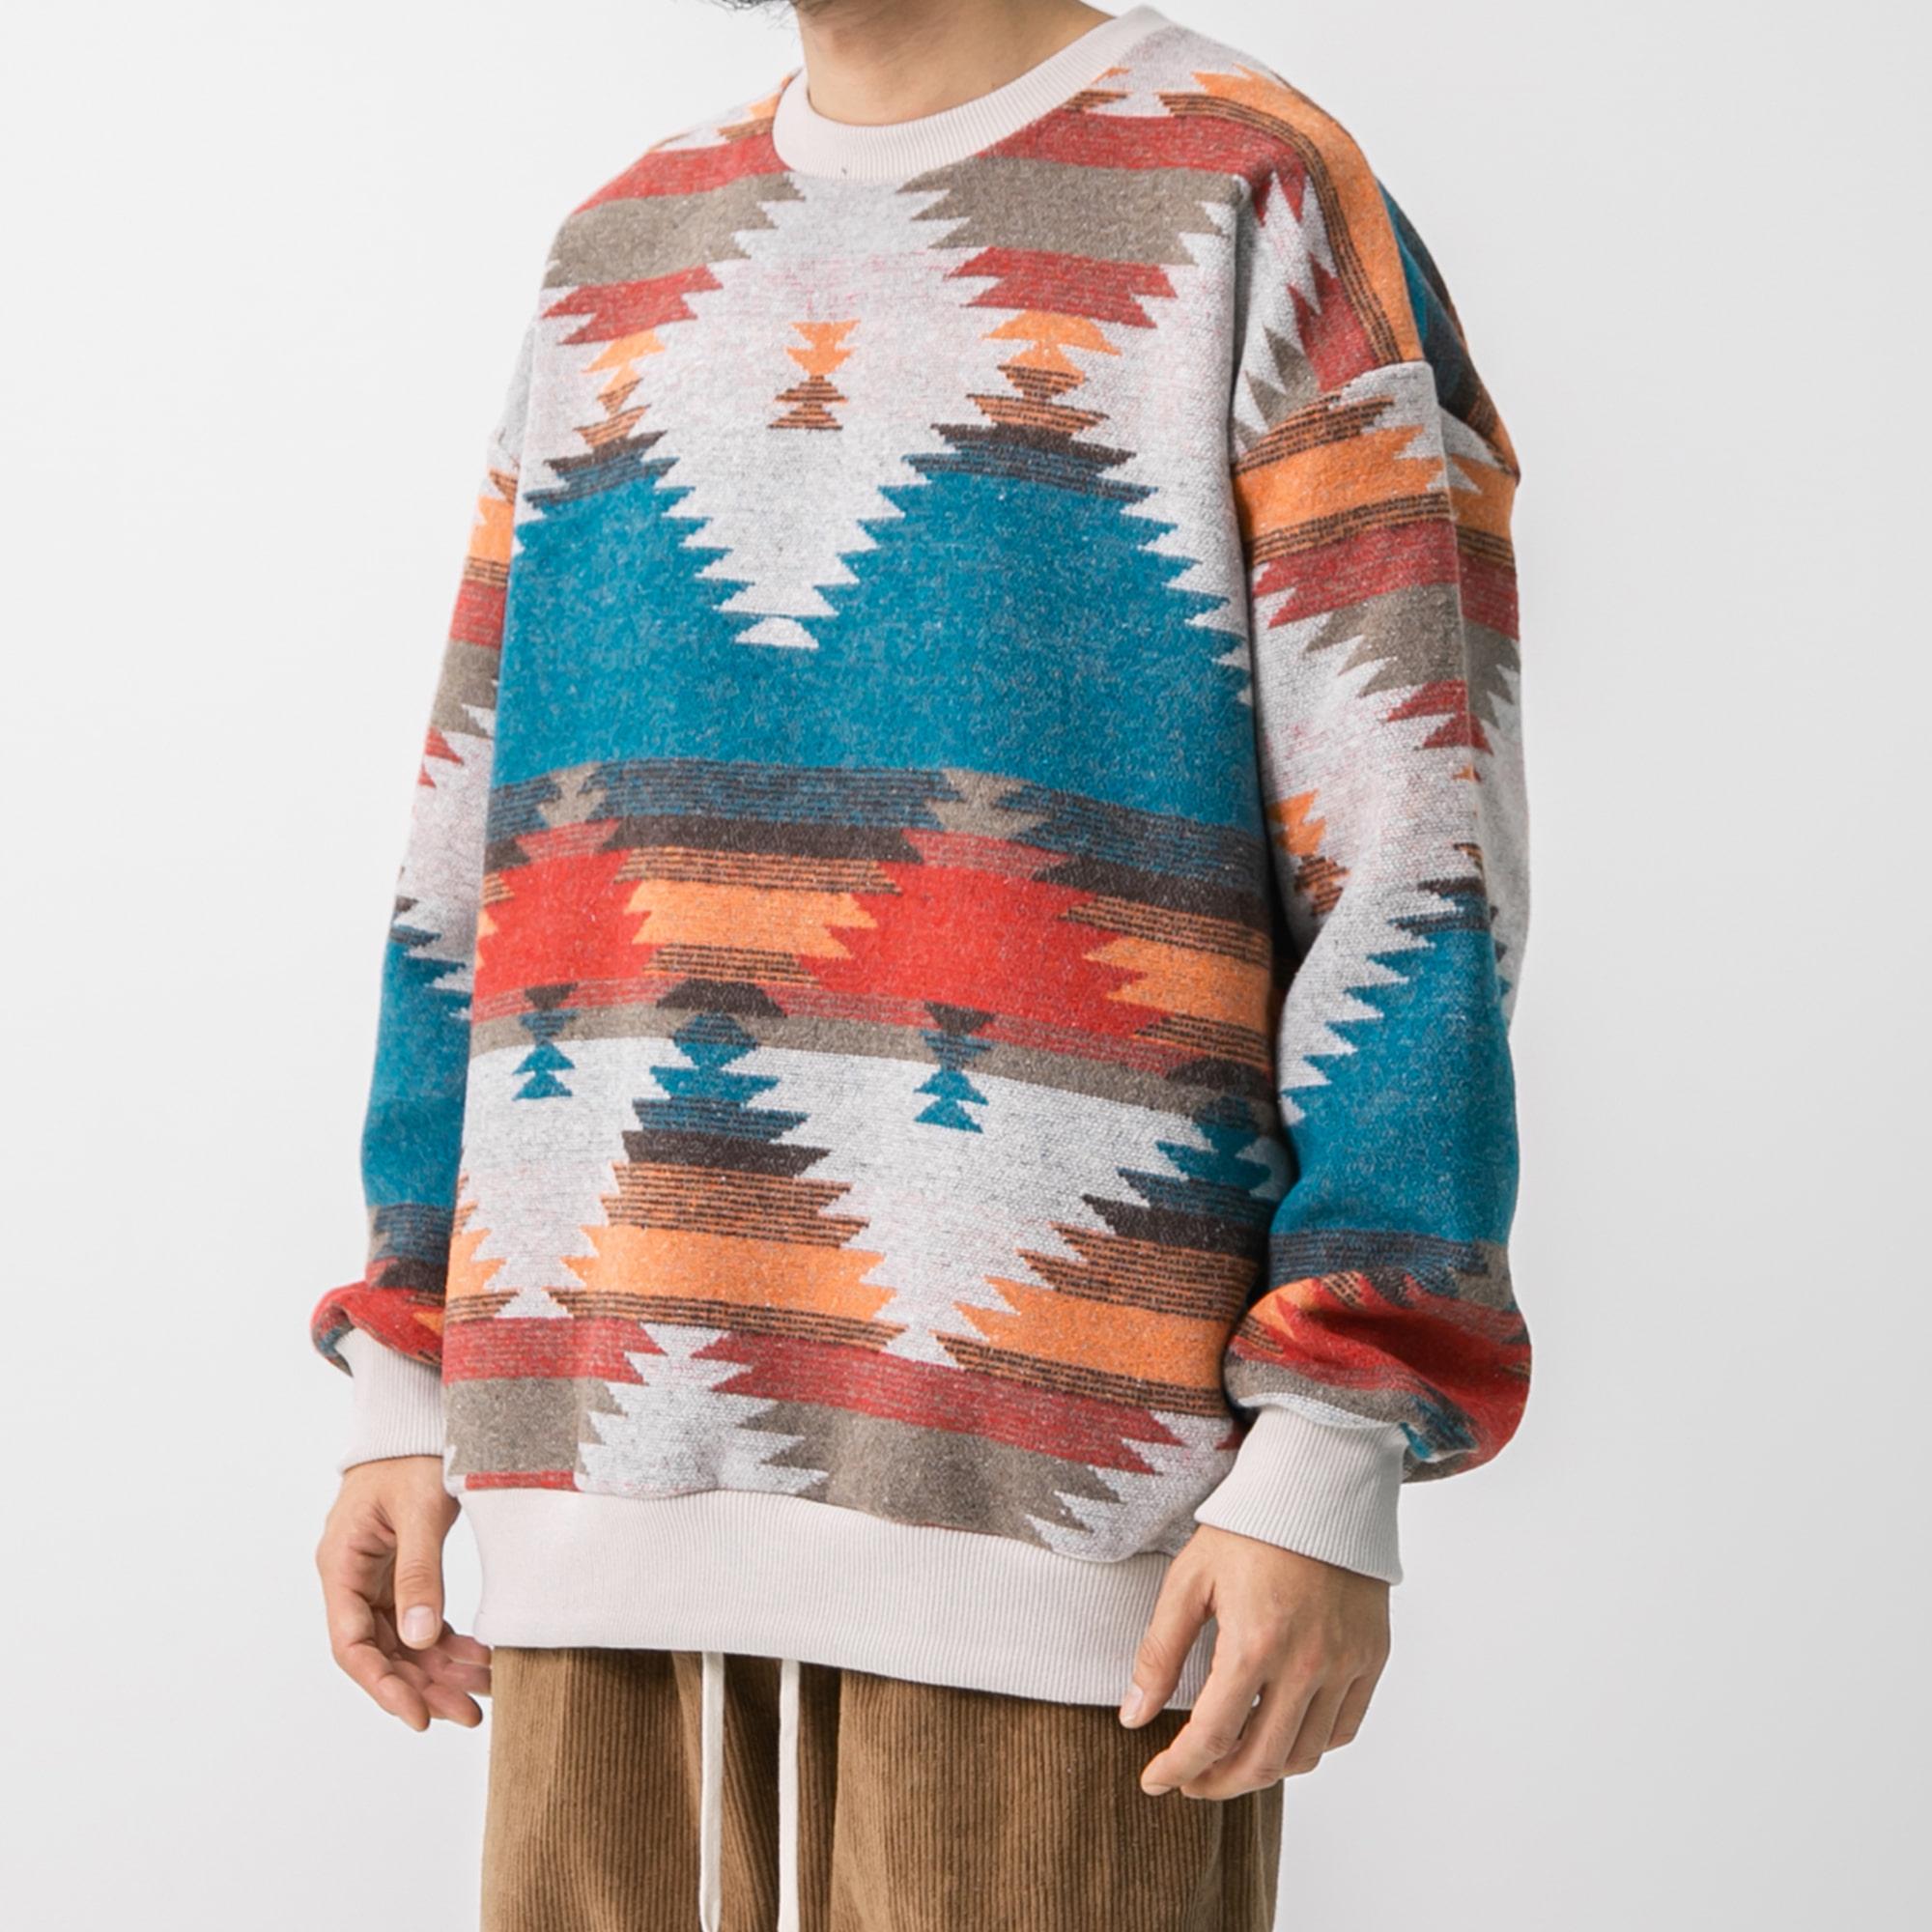 Ethnic Sweat Shirt - Multi